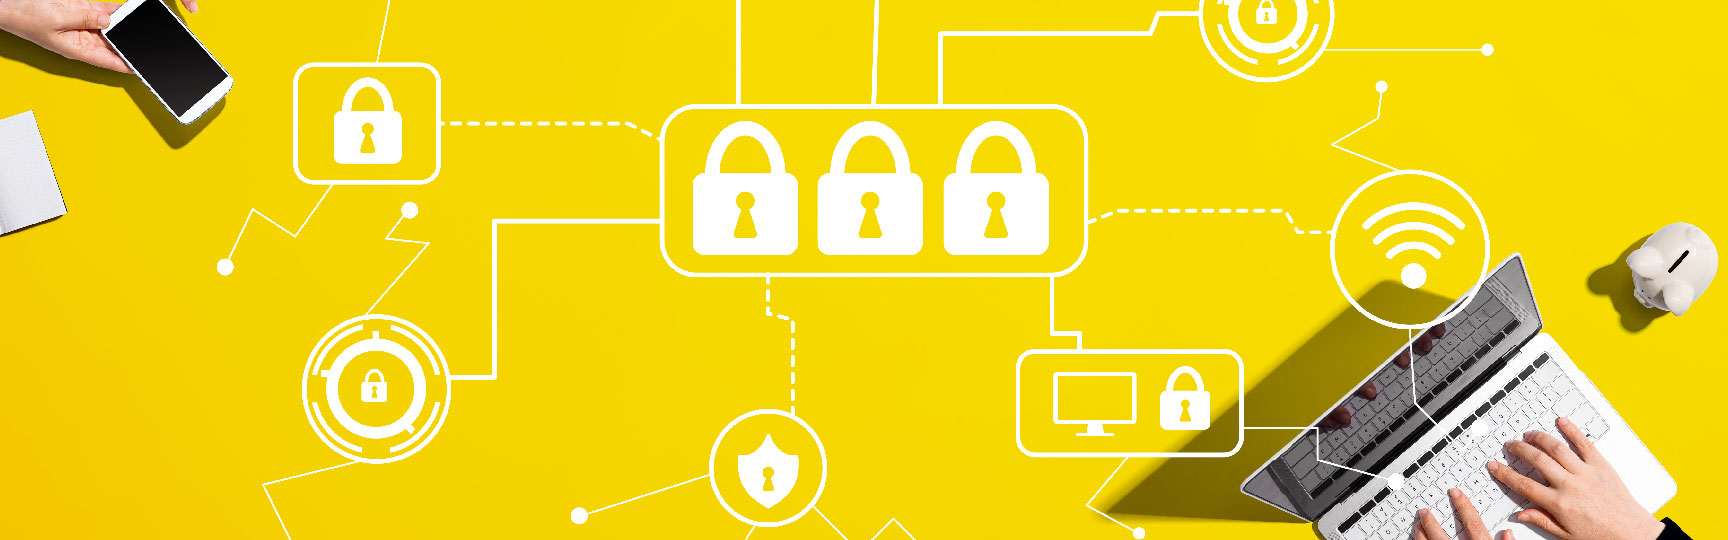 Worldwide Cyberattack From Wannacry Ransomware Virus